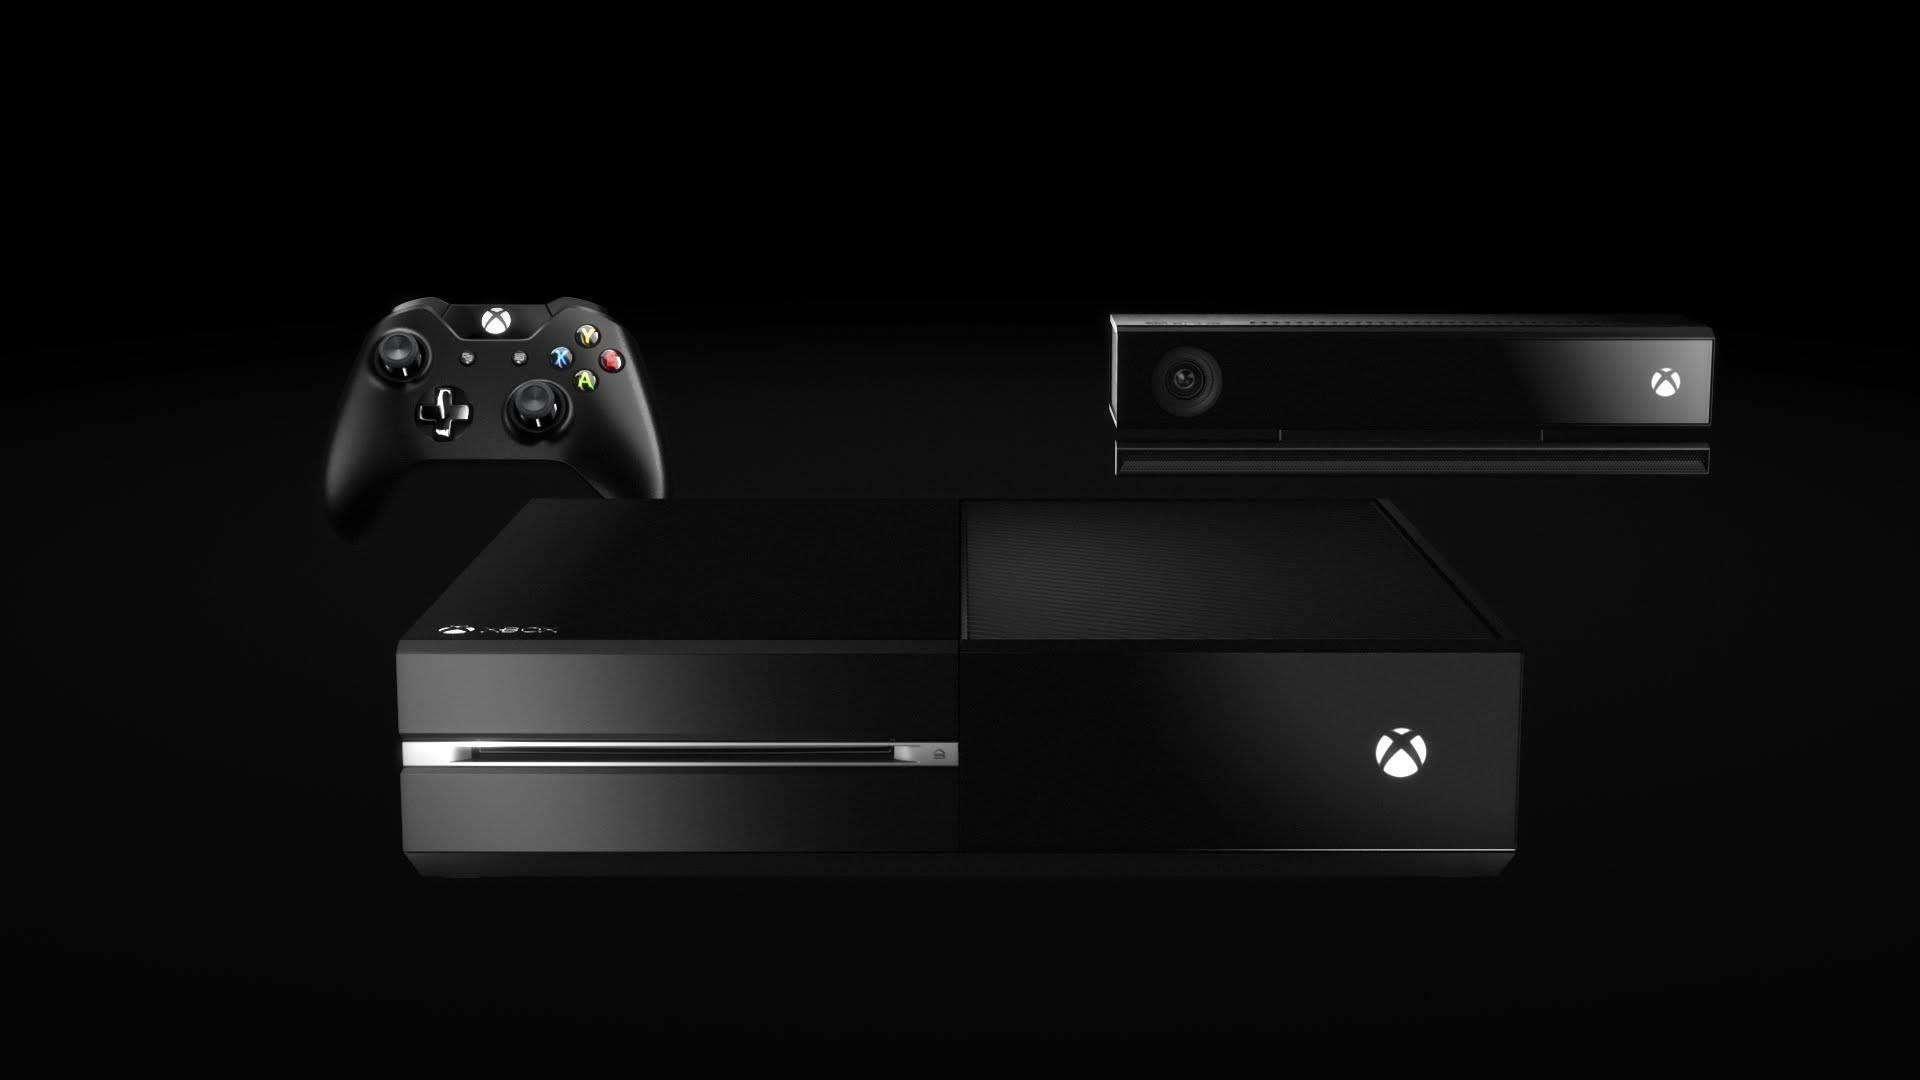 [50+] Xbox One Wallpaper 1080P on WallpaperSafari